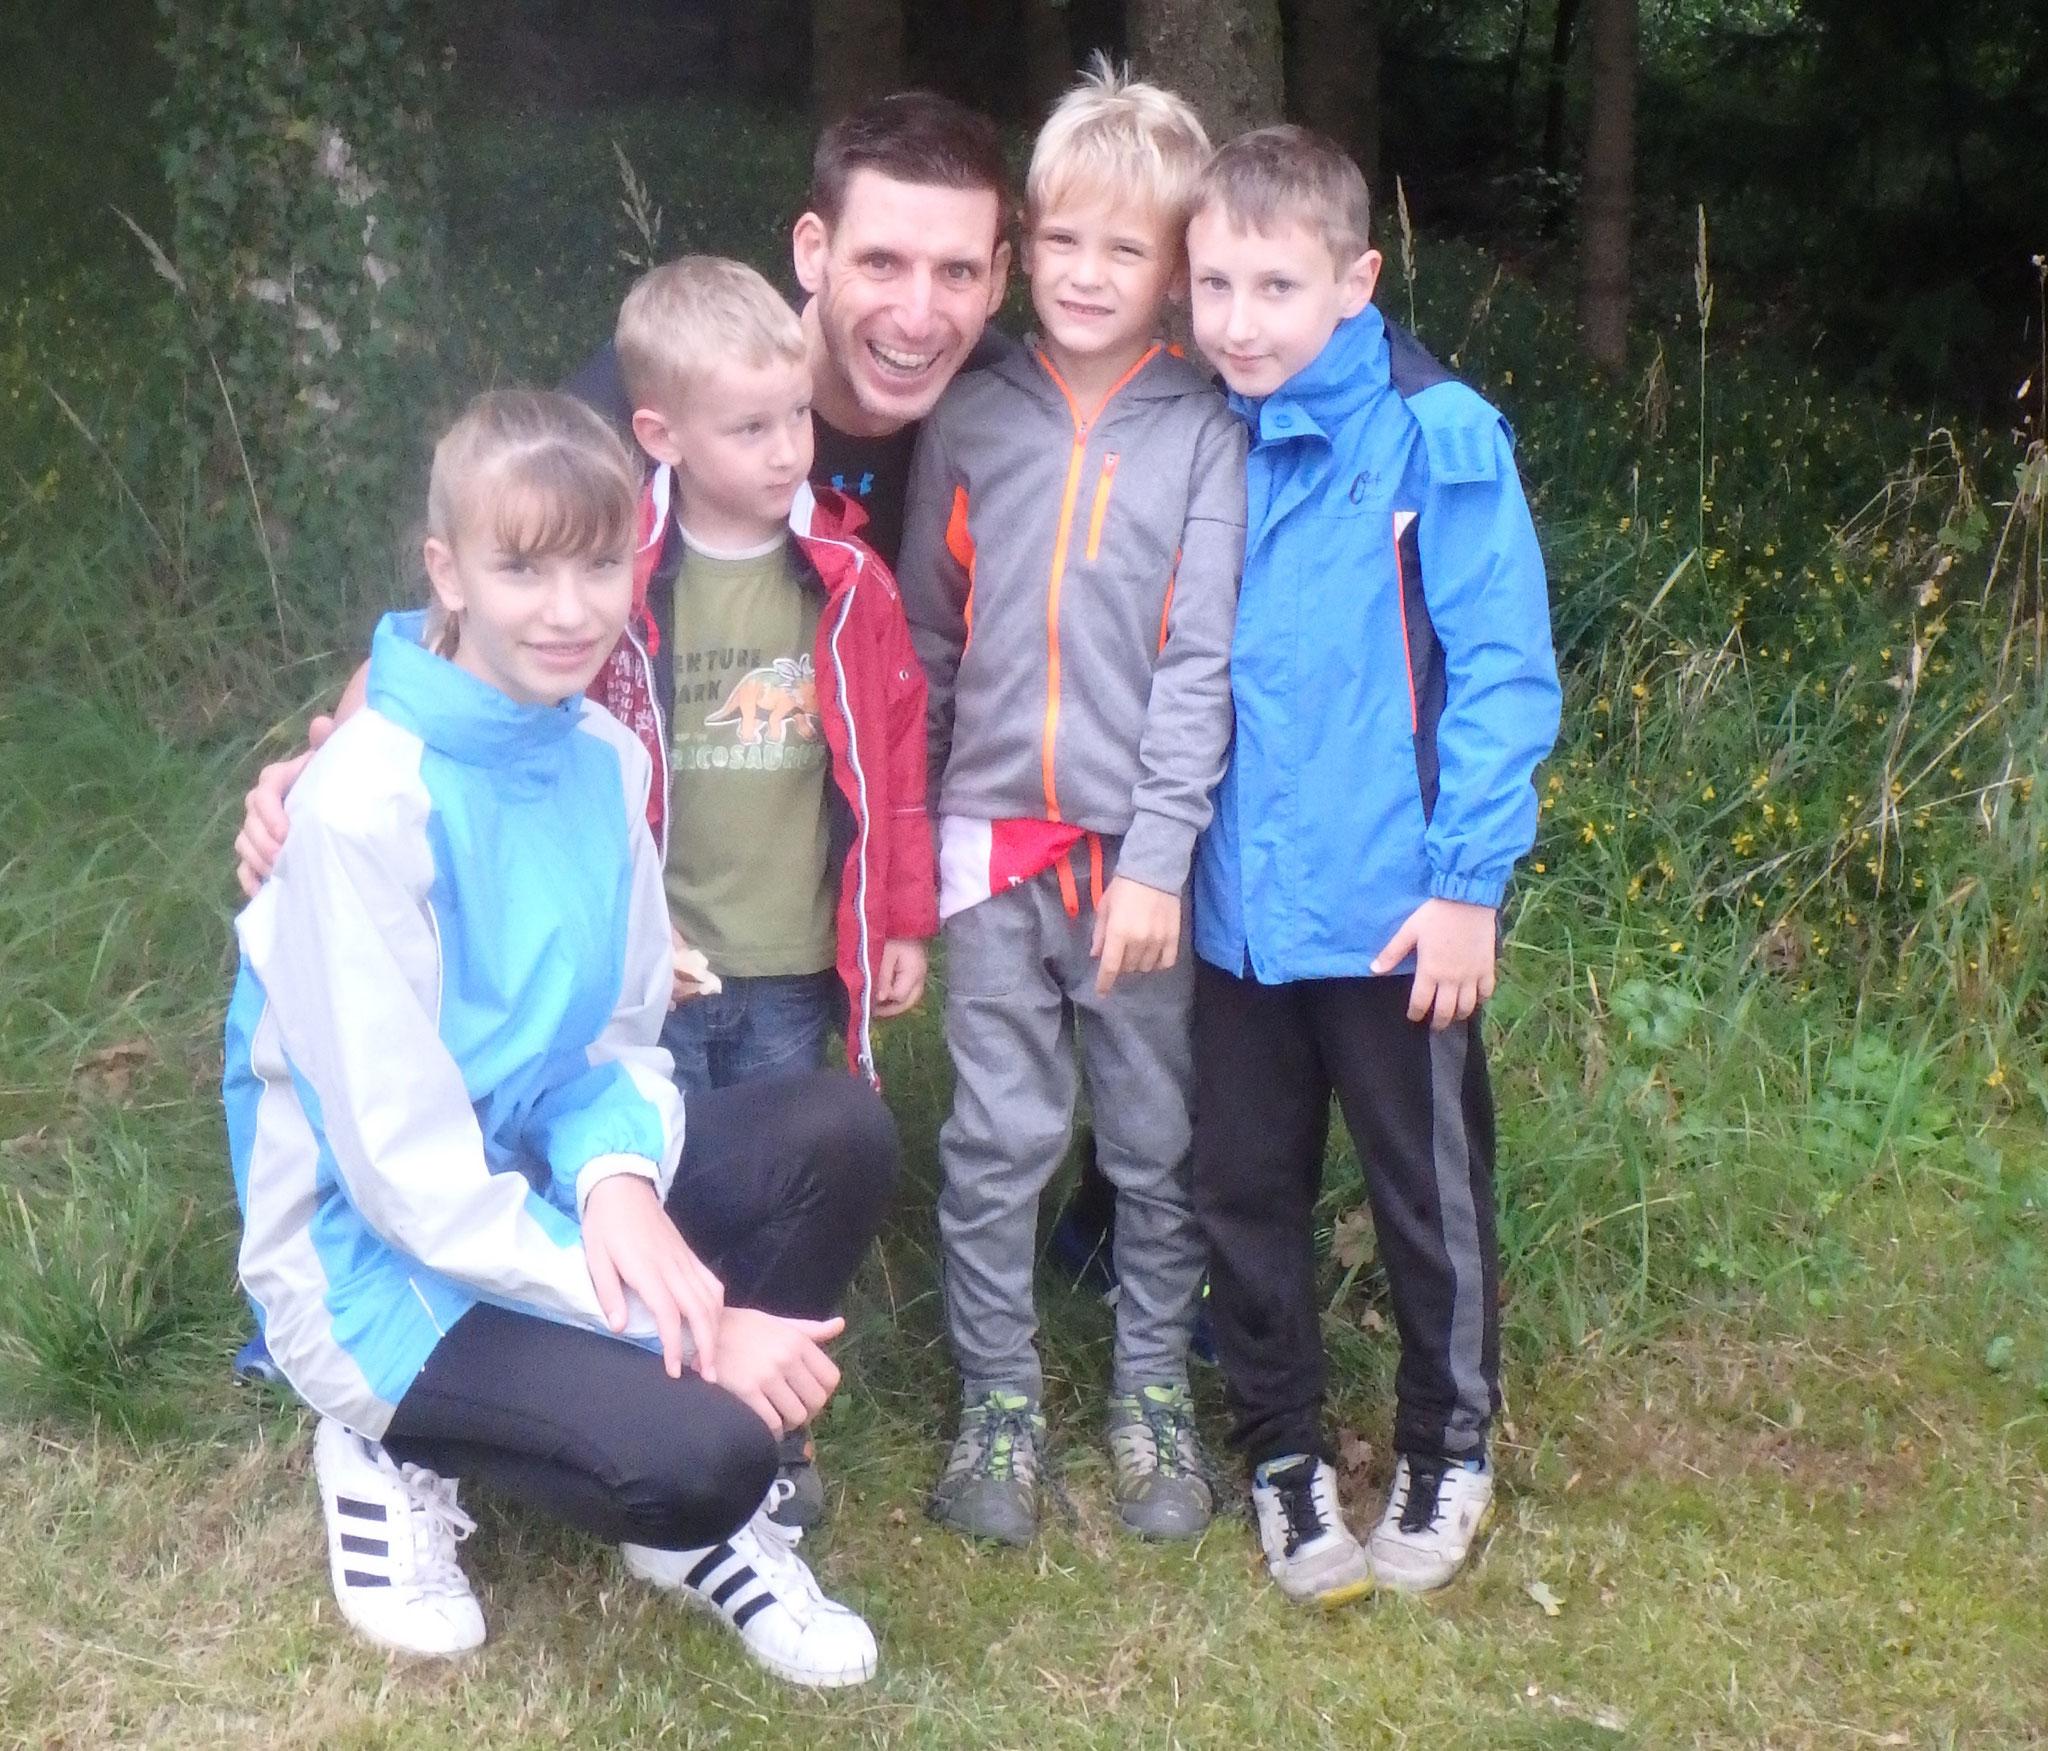 Boot Camp 4 Kids